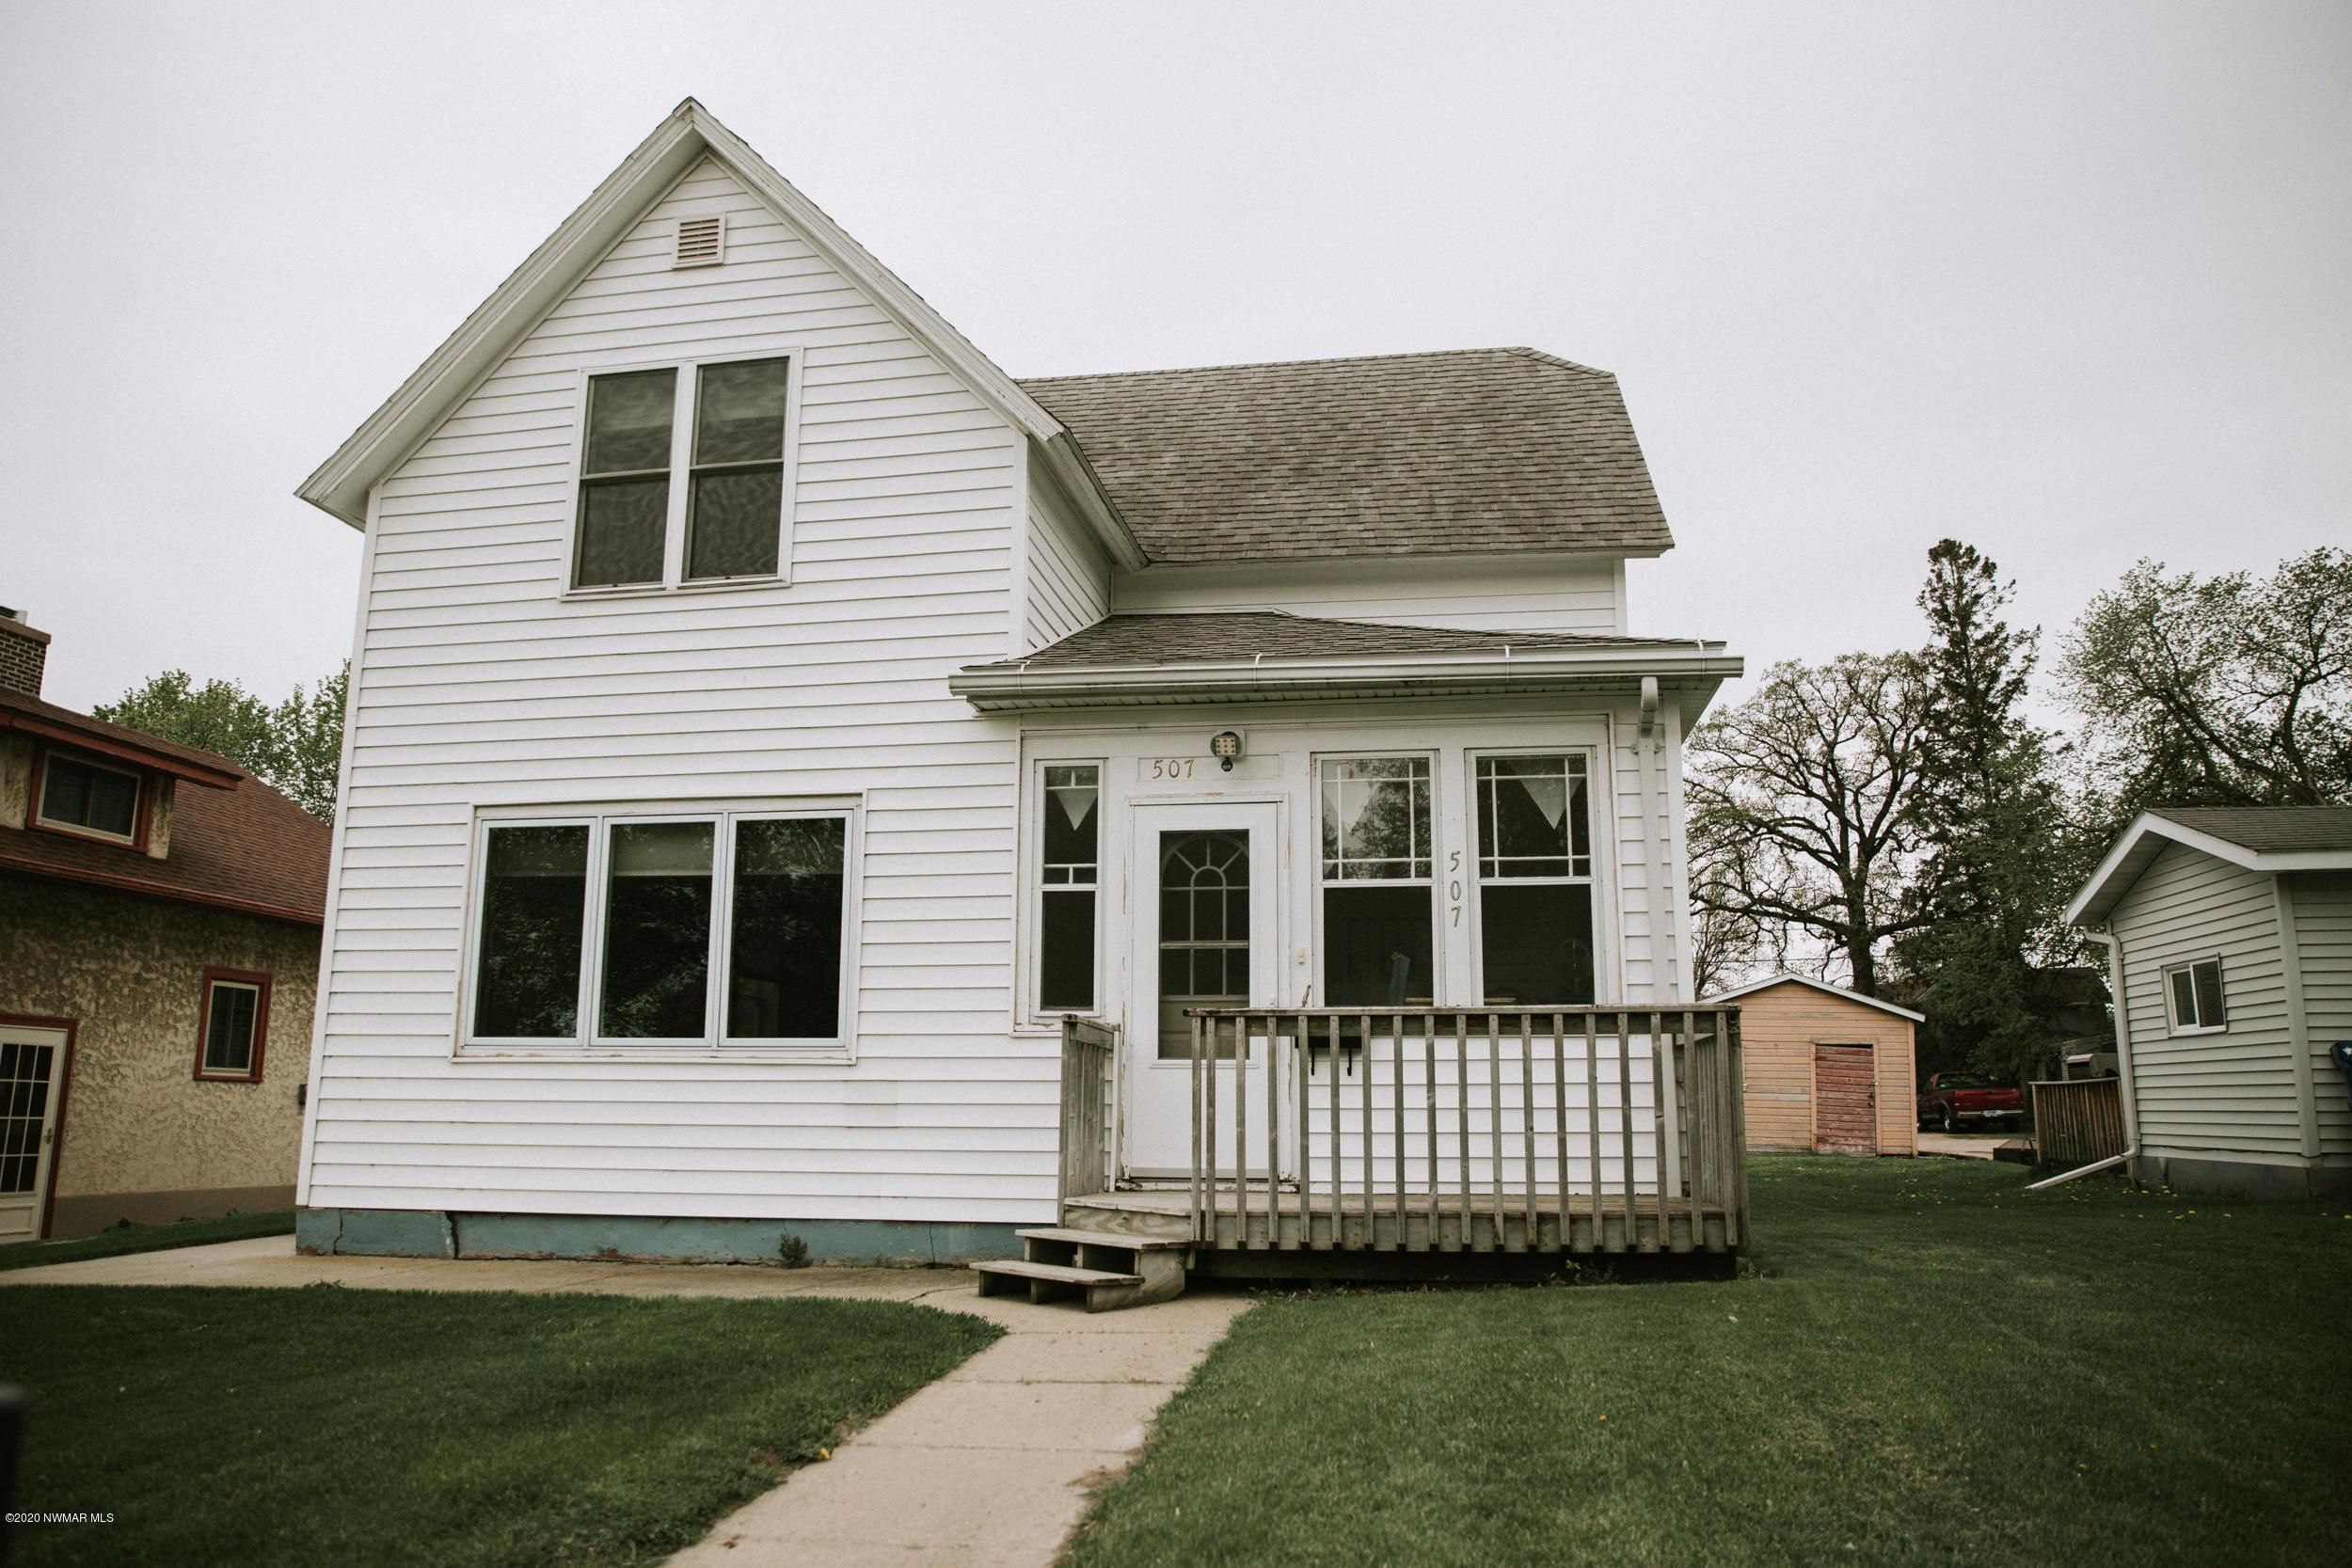 507 Stuart Property Photo - Crookston, MN real estate listing